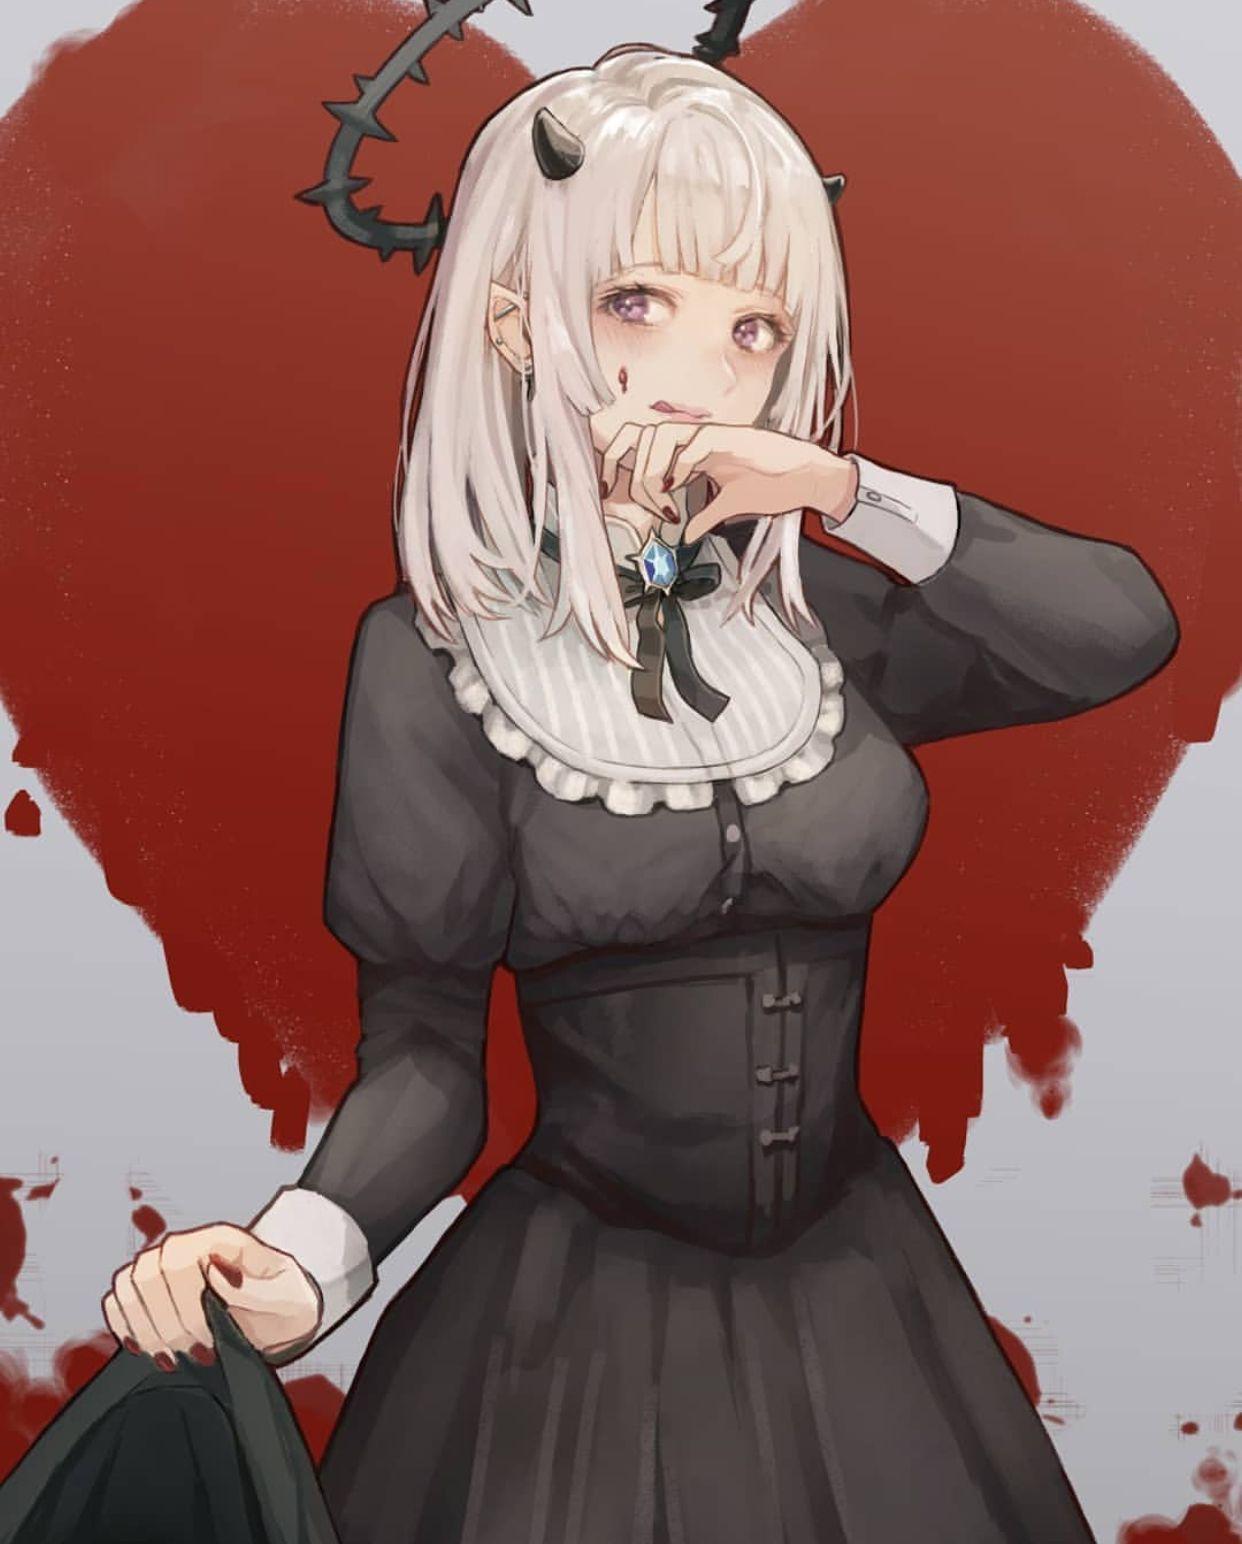 The Villainess School Girl